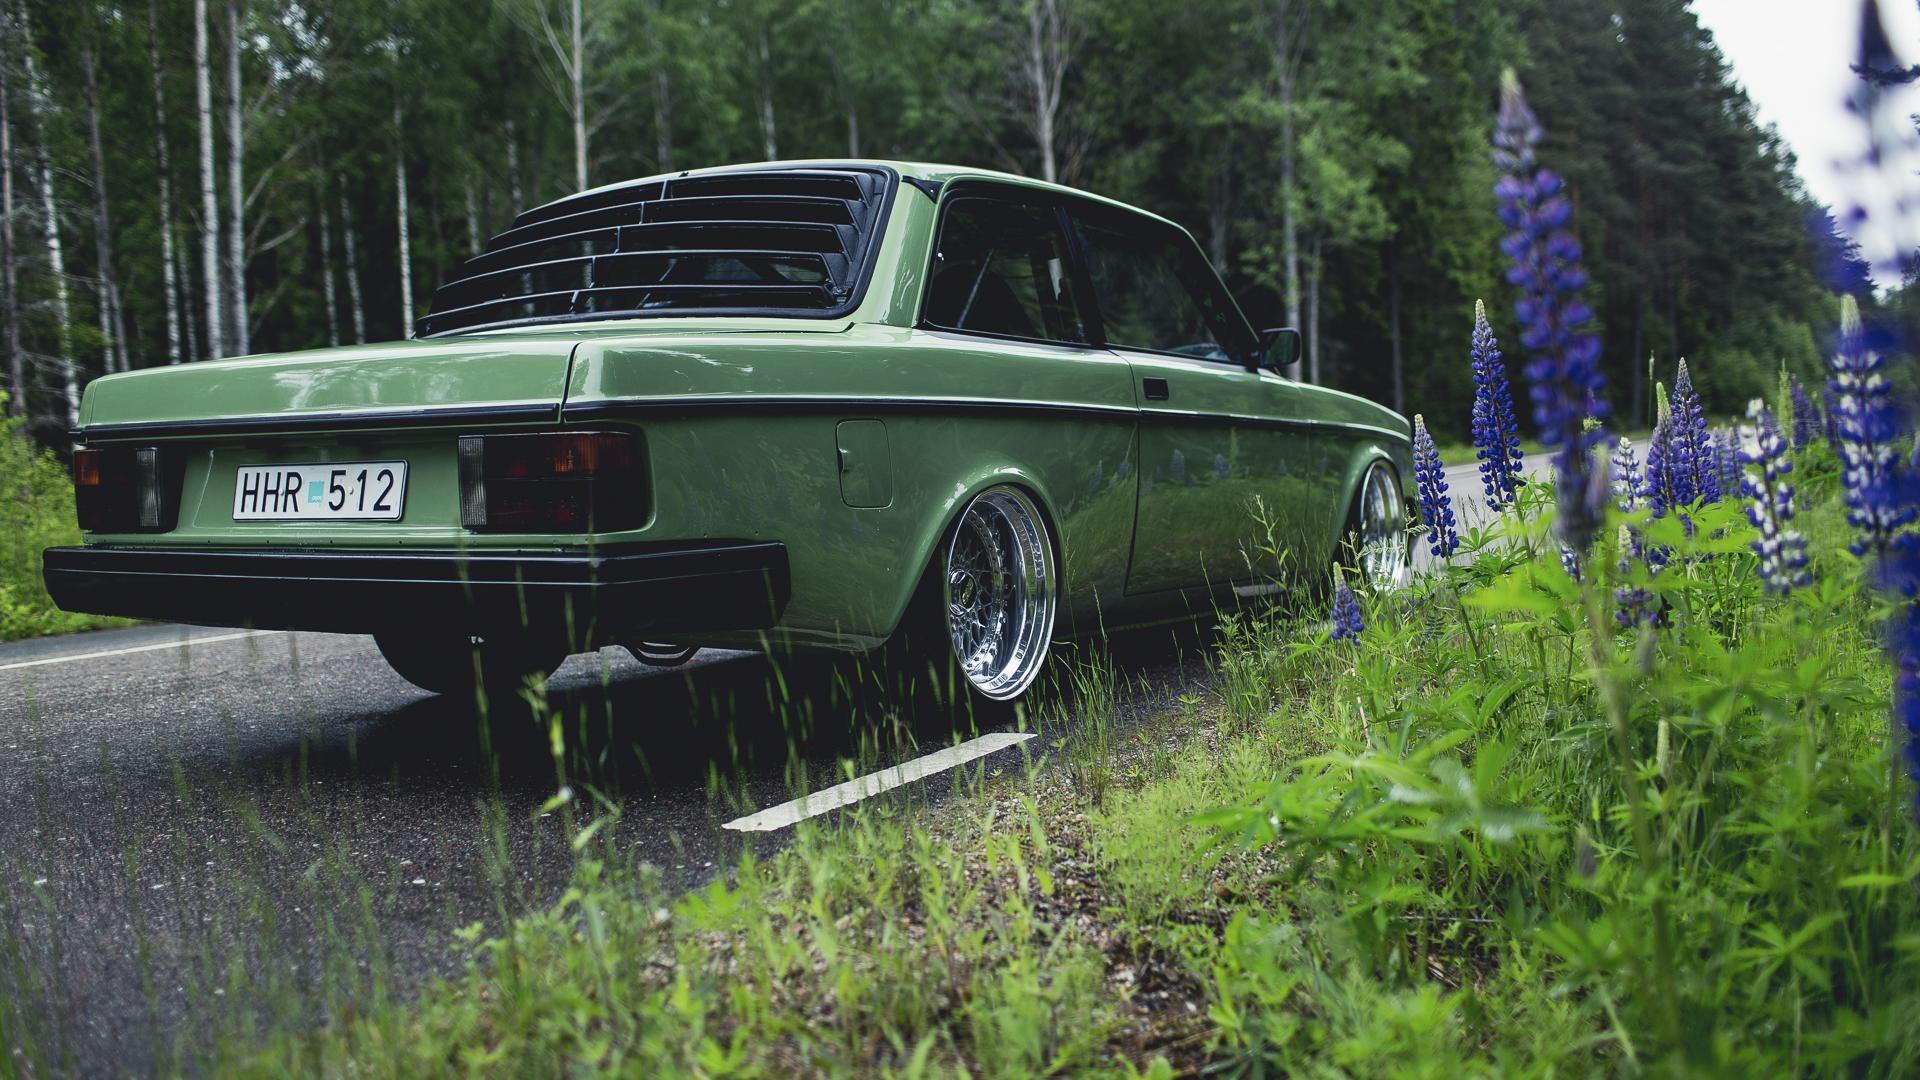 Wallpaper 1920x1080 Px Car Green Nature Road Volvo 240